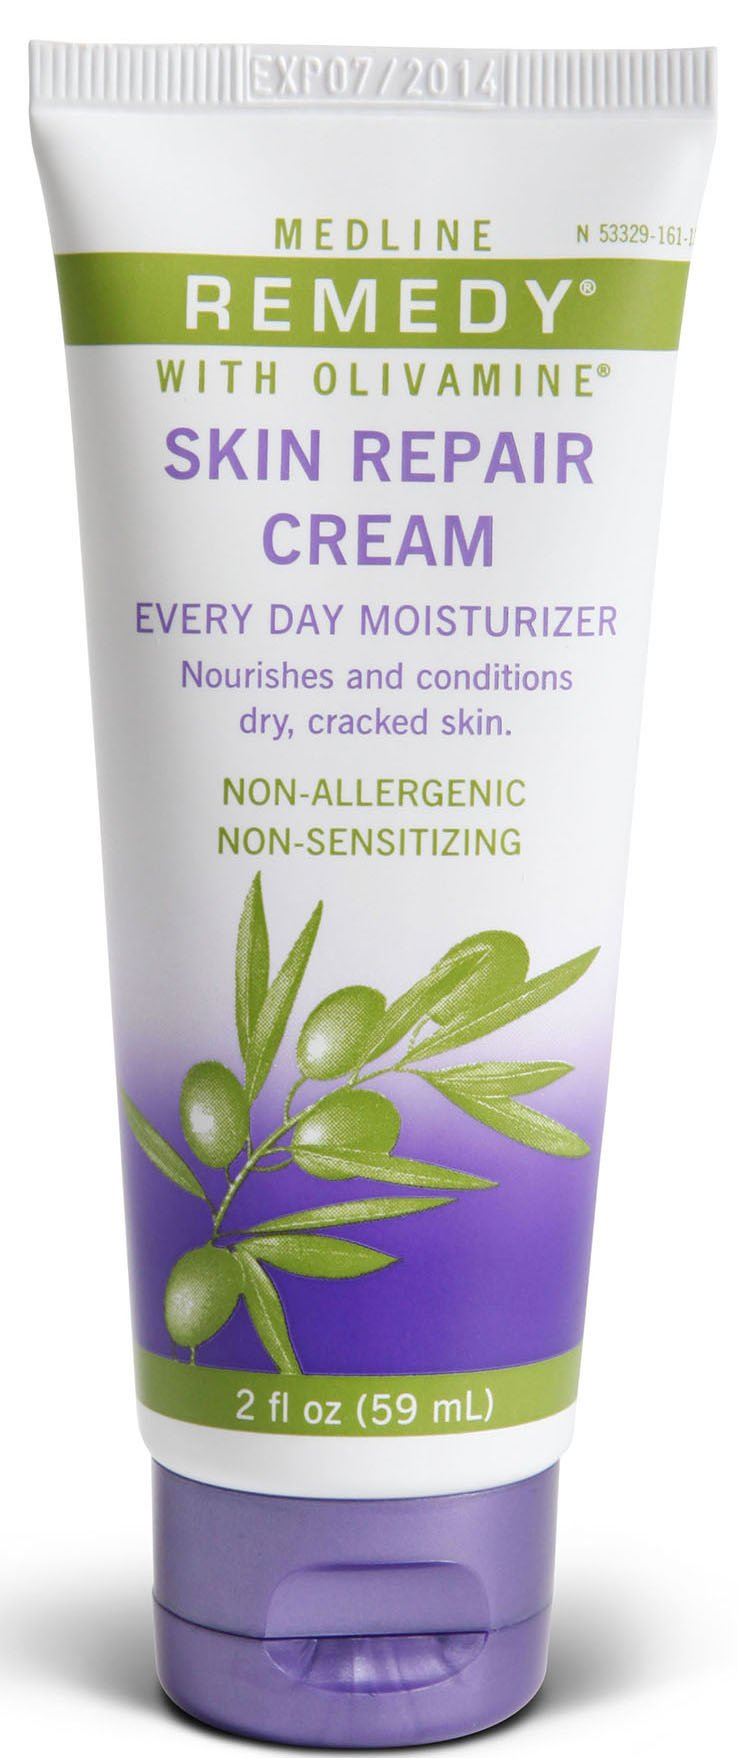 Medline MSC094422H Remedy Olivamine Skin Repair Cream, Off White